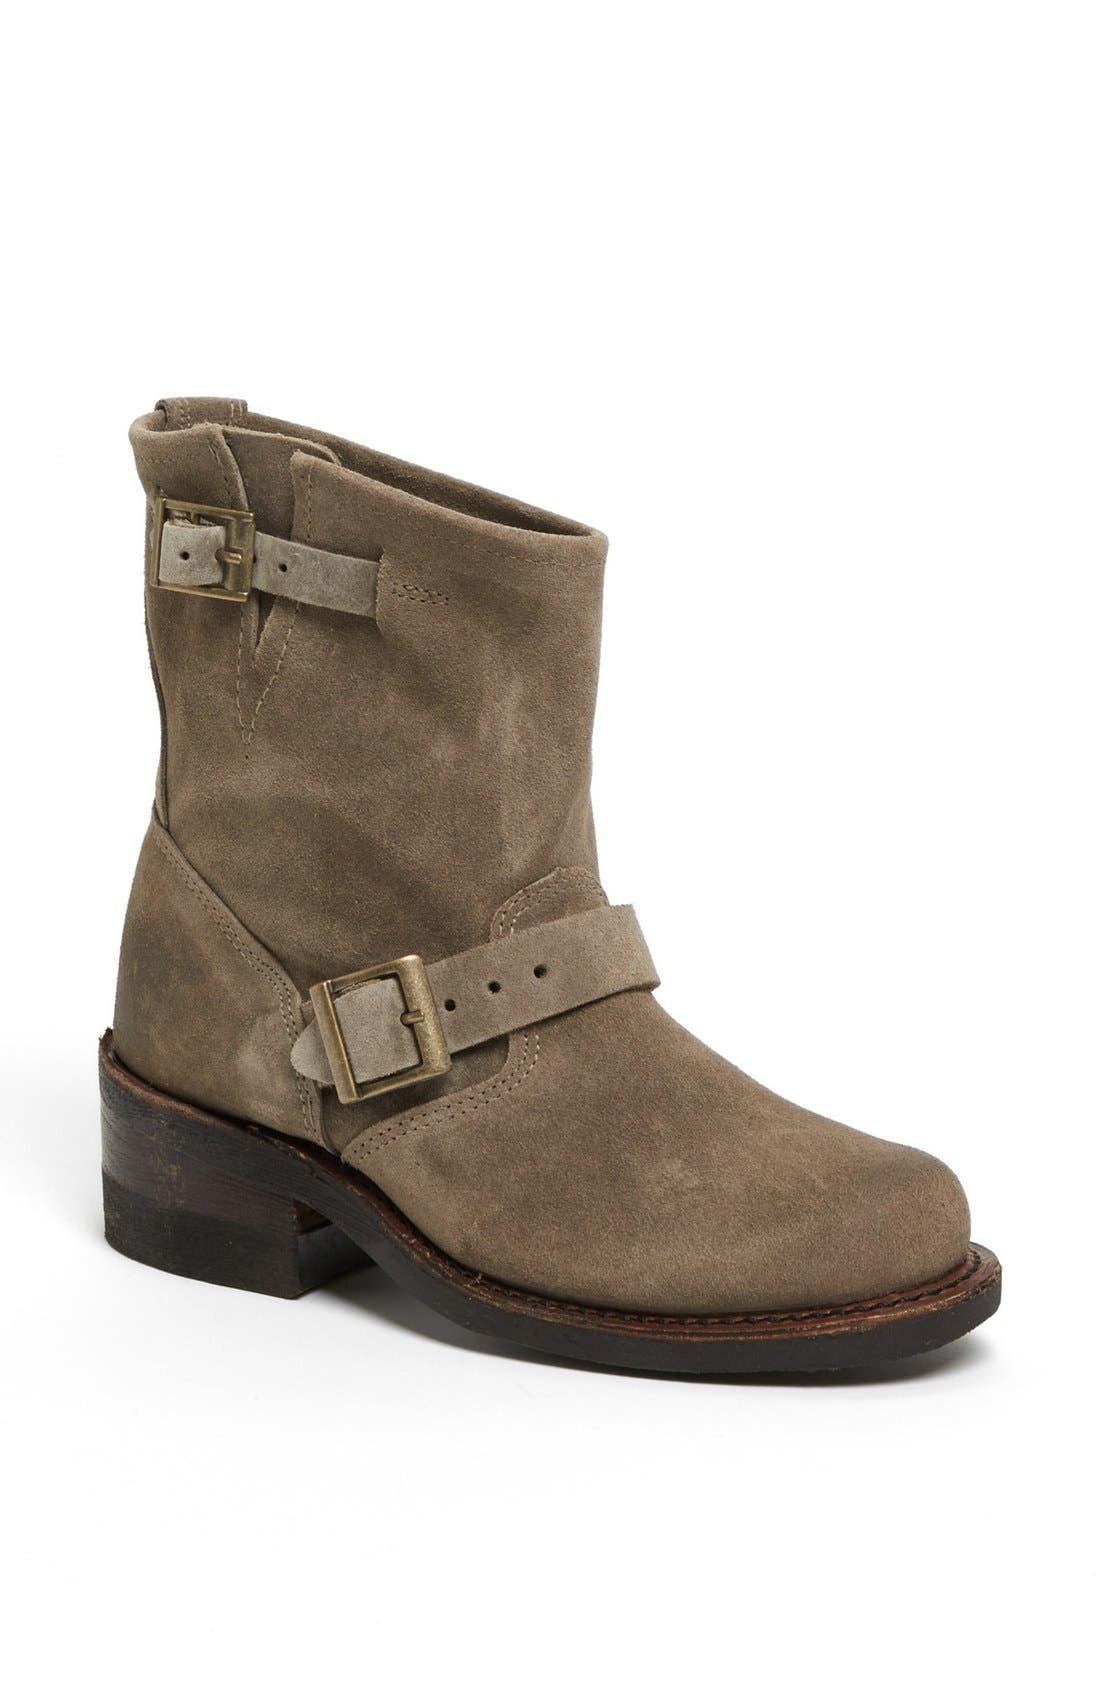 Main Image - Vintage Shoe Company 'Sophie' Suede Boot